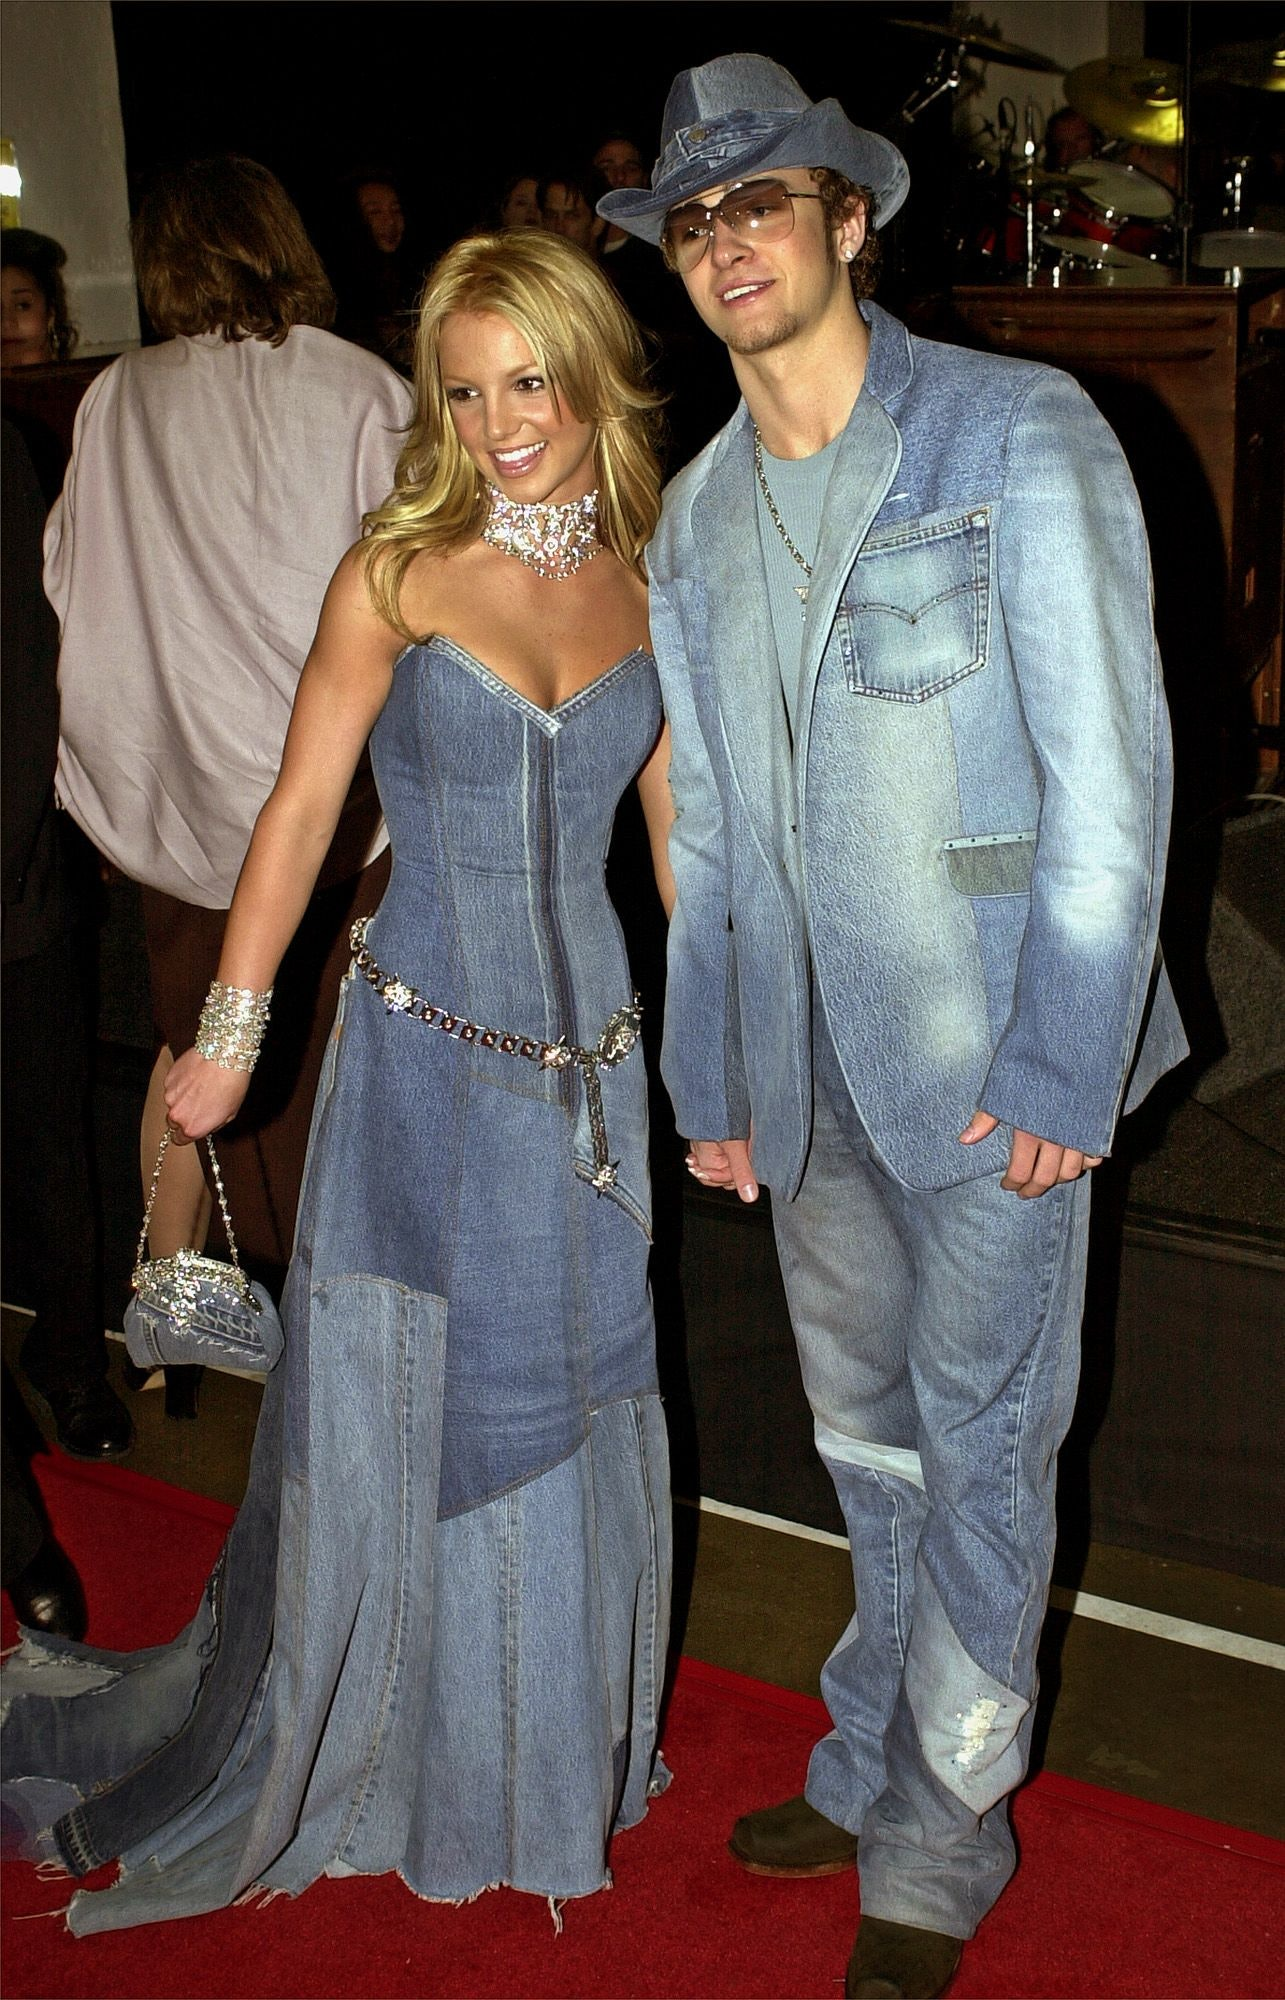 Allie Hamilton Outfits